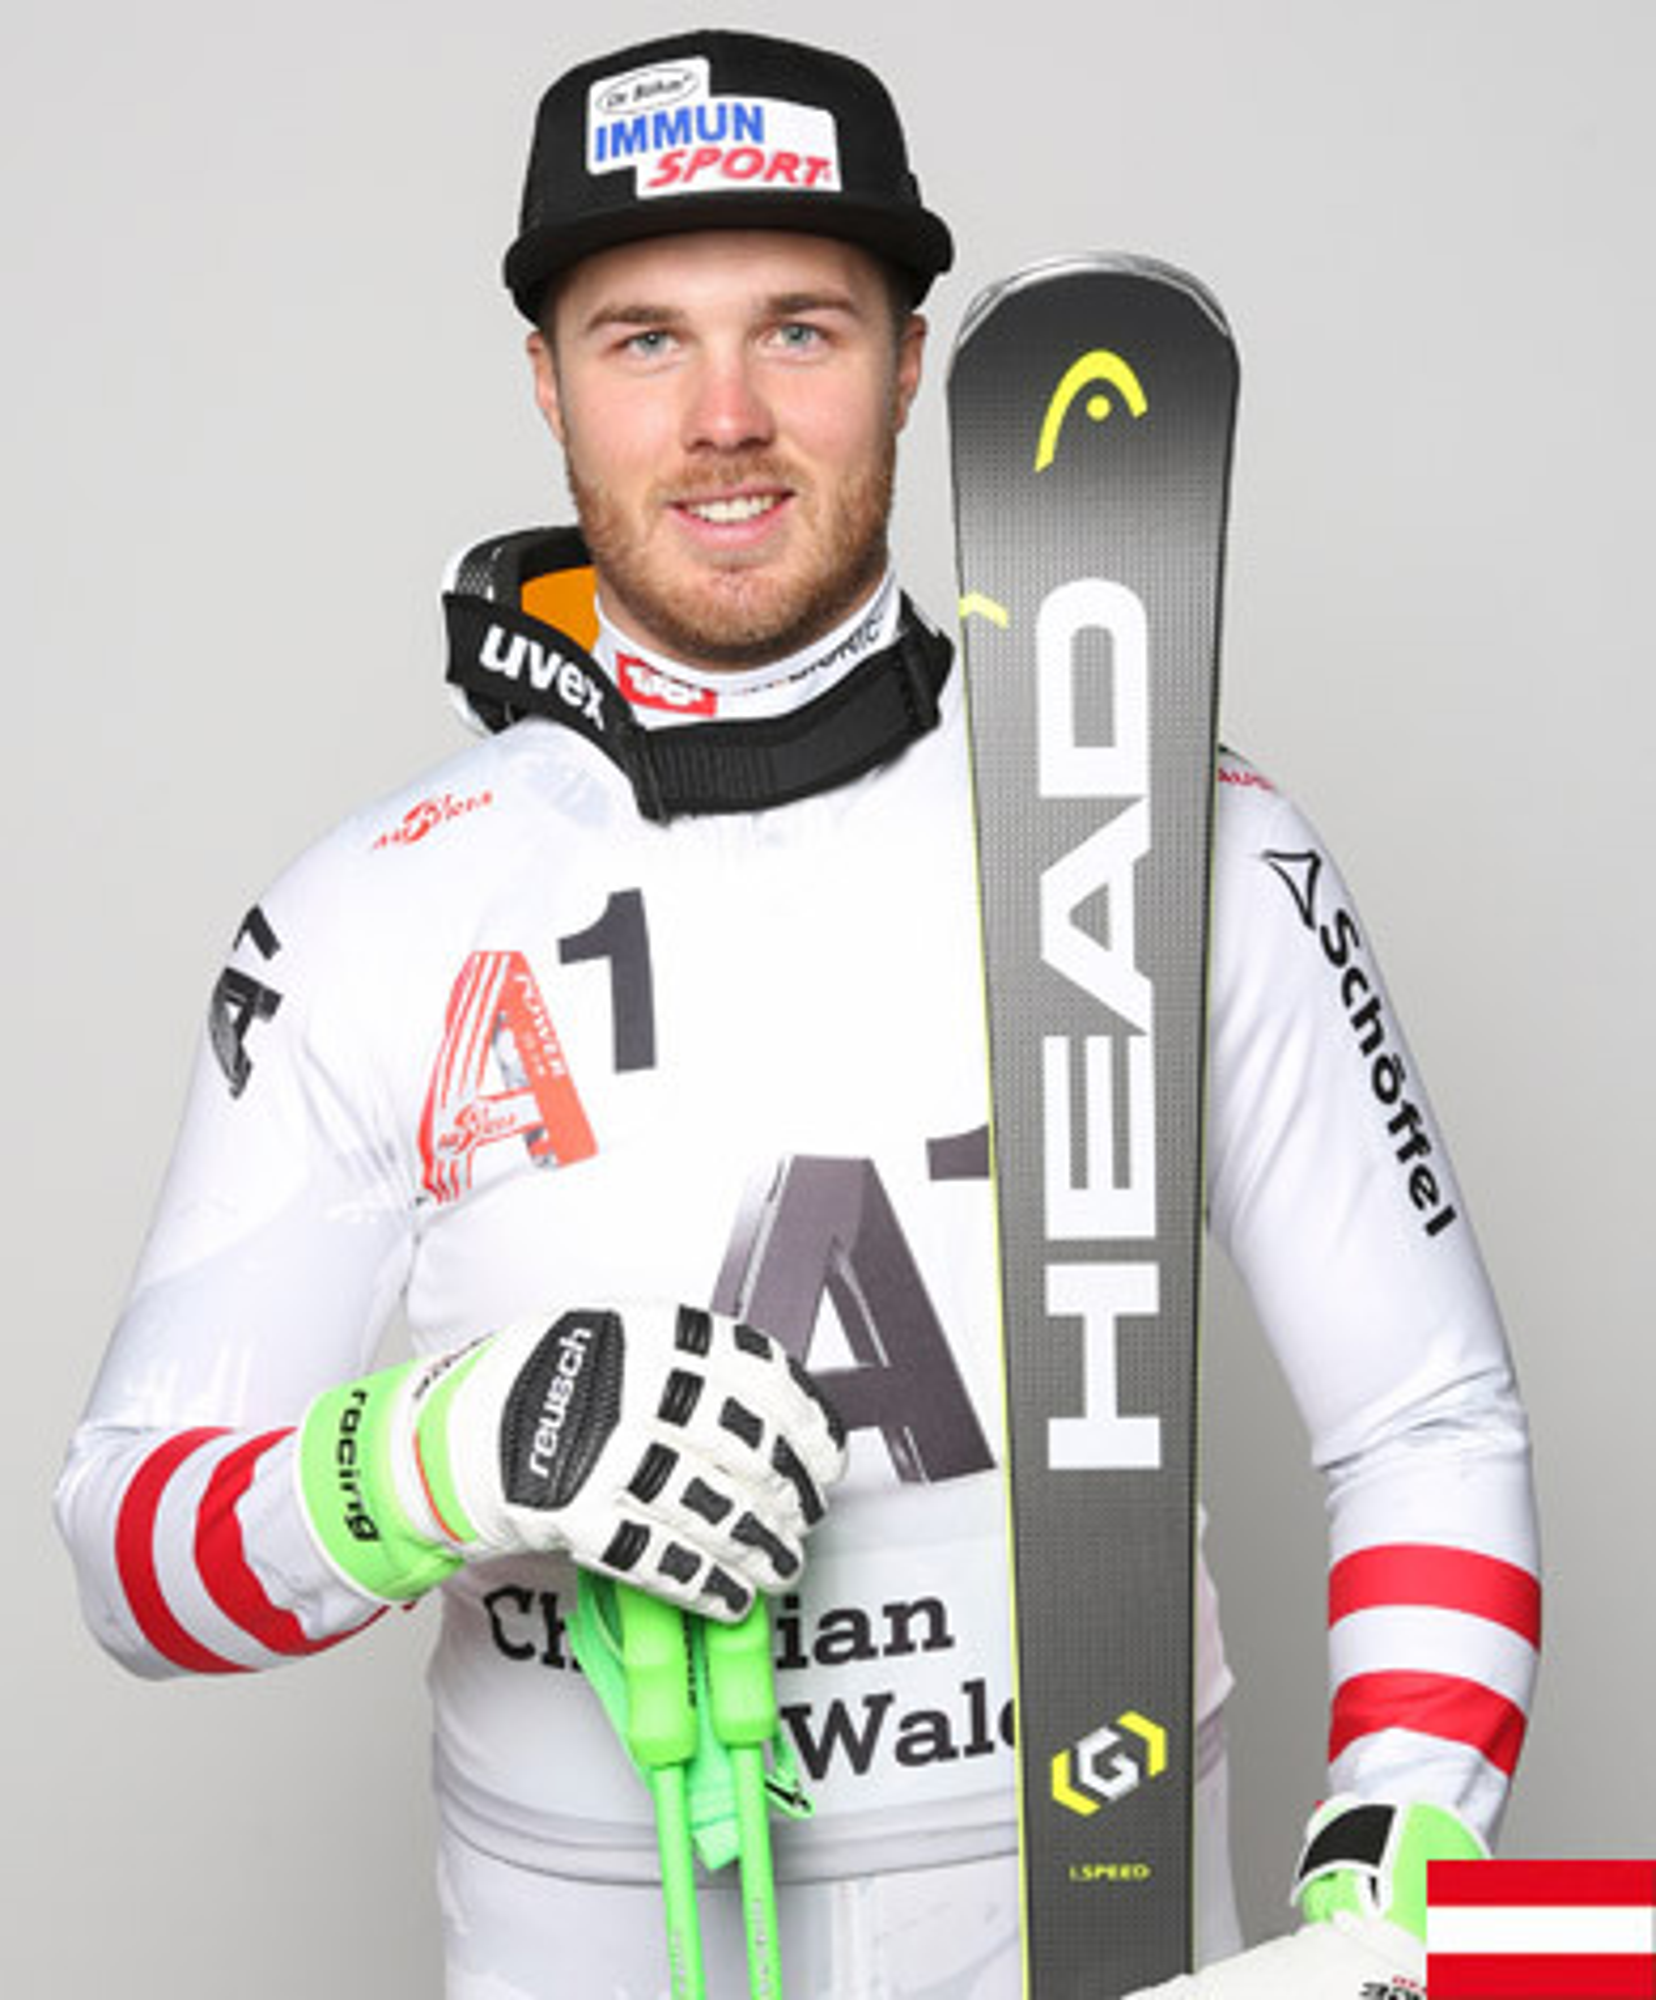 Christian Walder